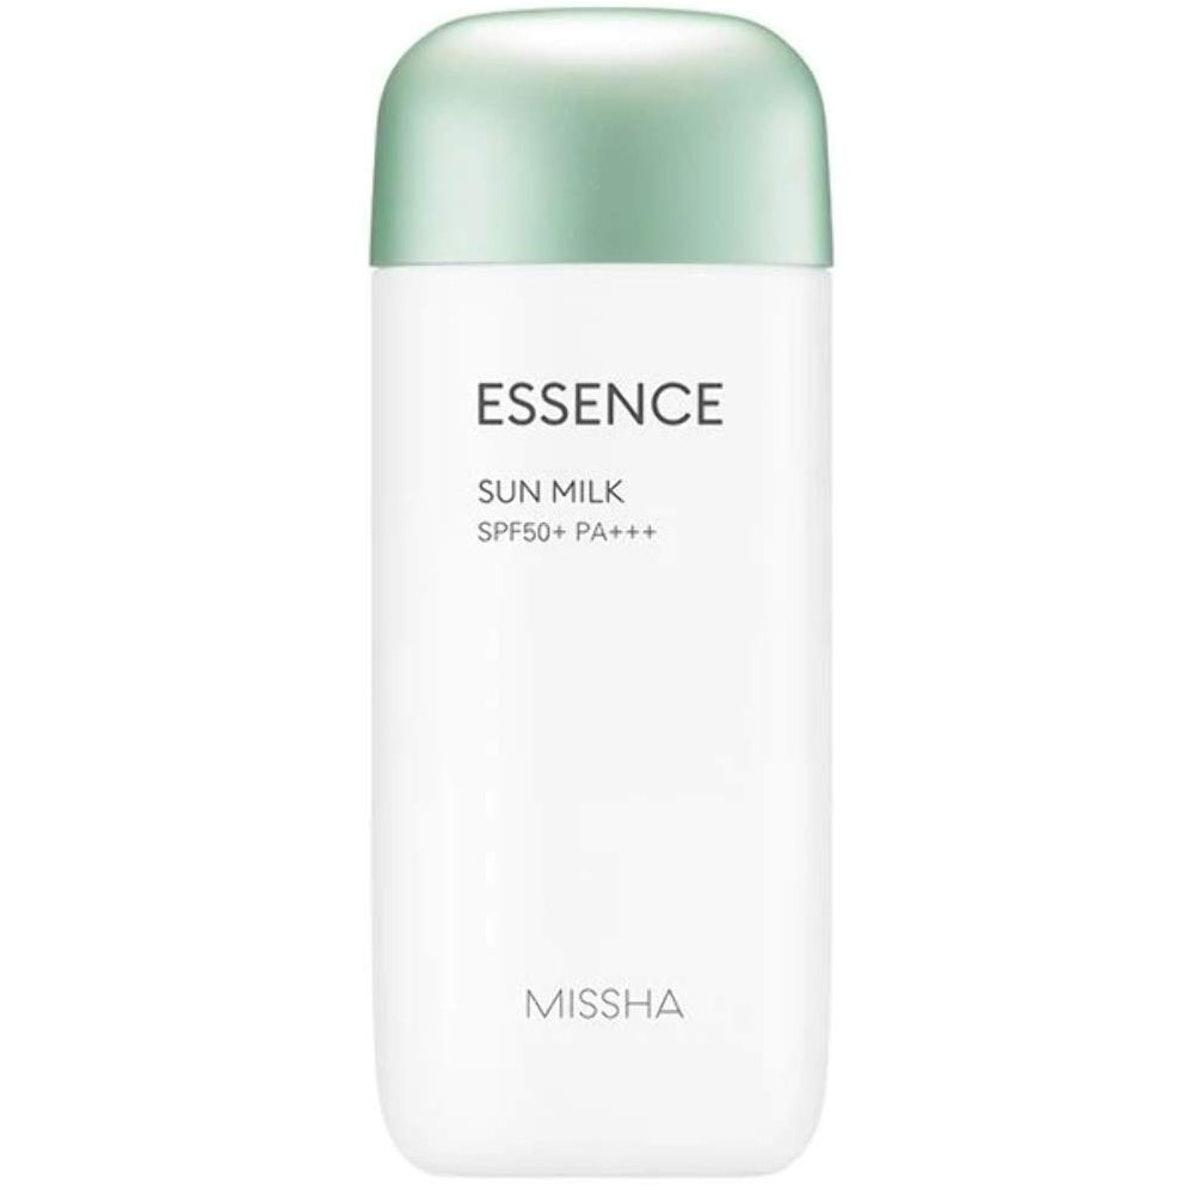 MISSHA All Around Safe Block Essence Sun Milk